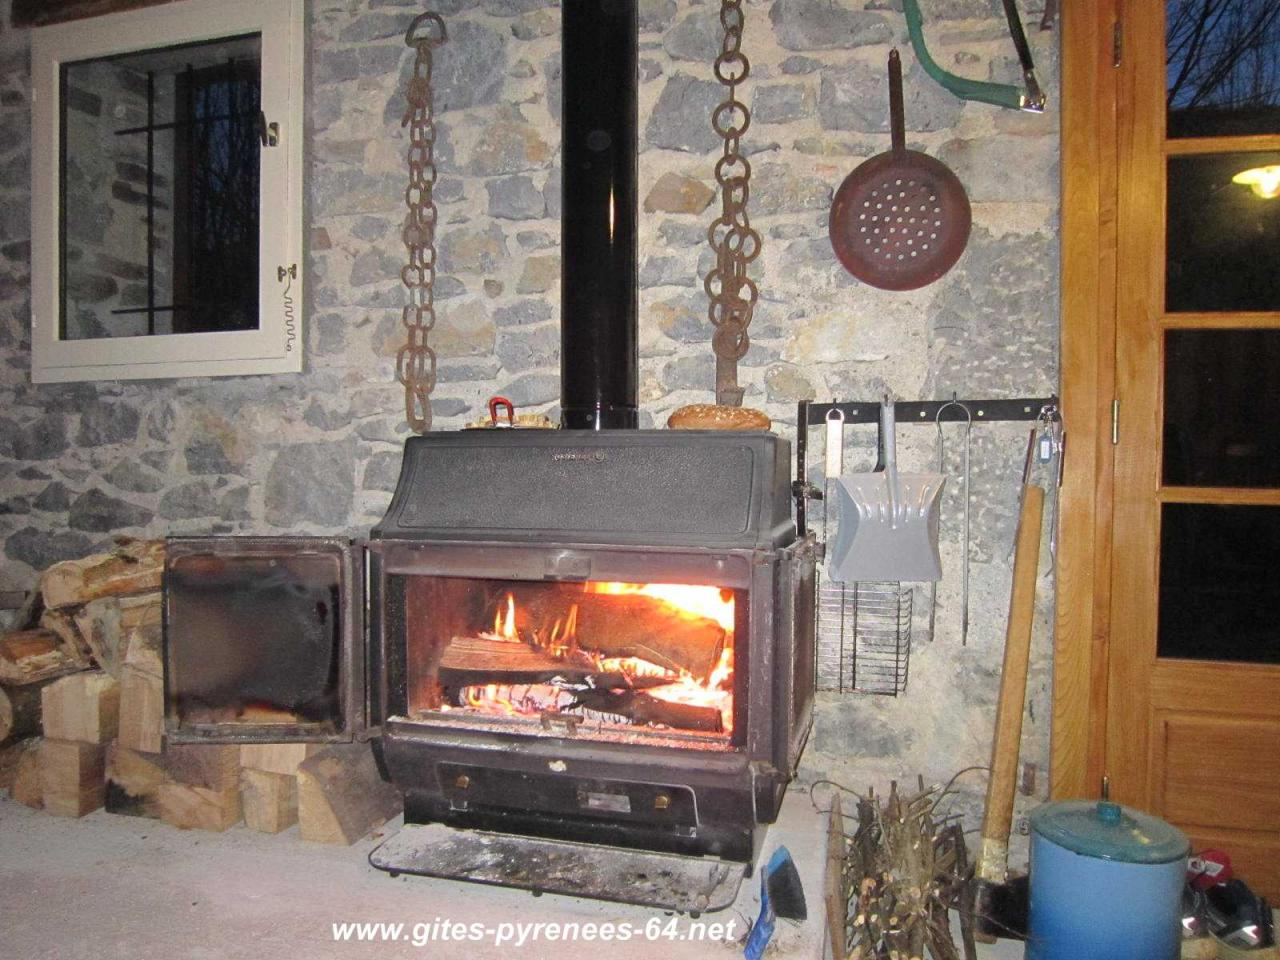 location insolite pyr n es atlantiques oloron en montagne. Black Bedroom Furniture Sets. Home Design Ideas